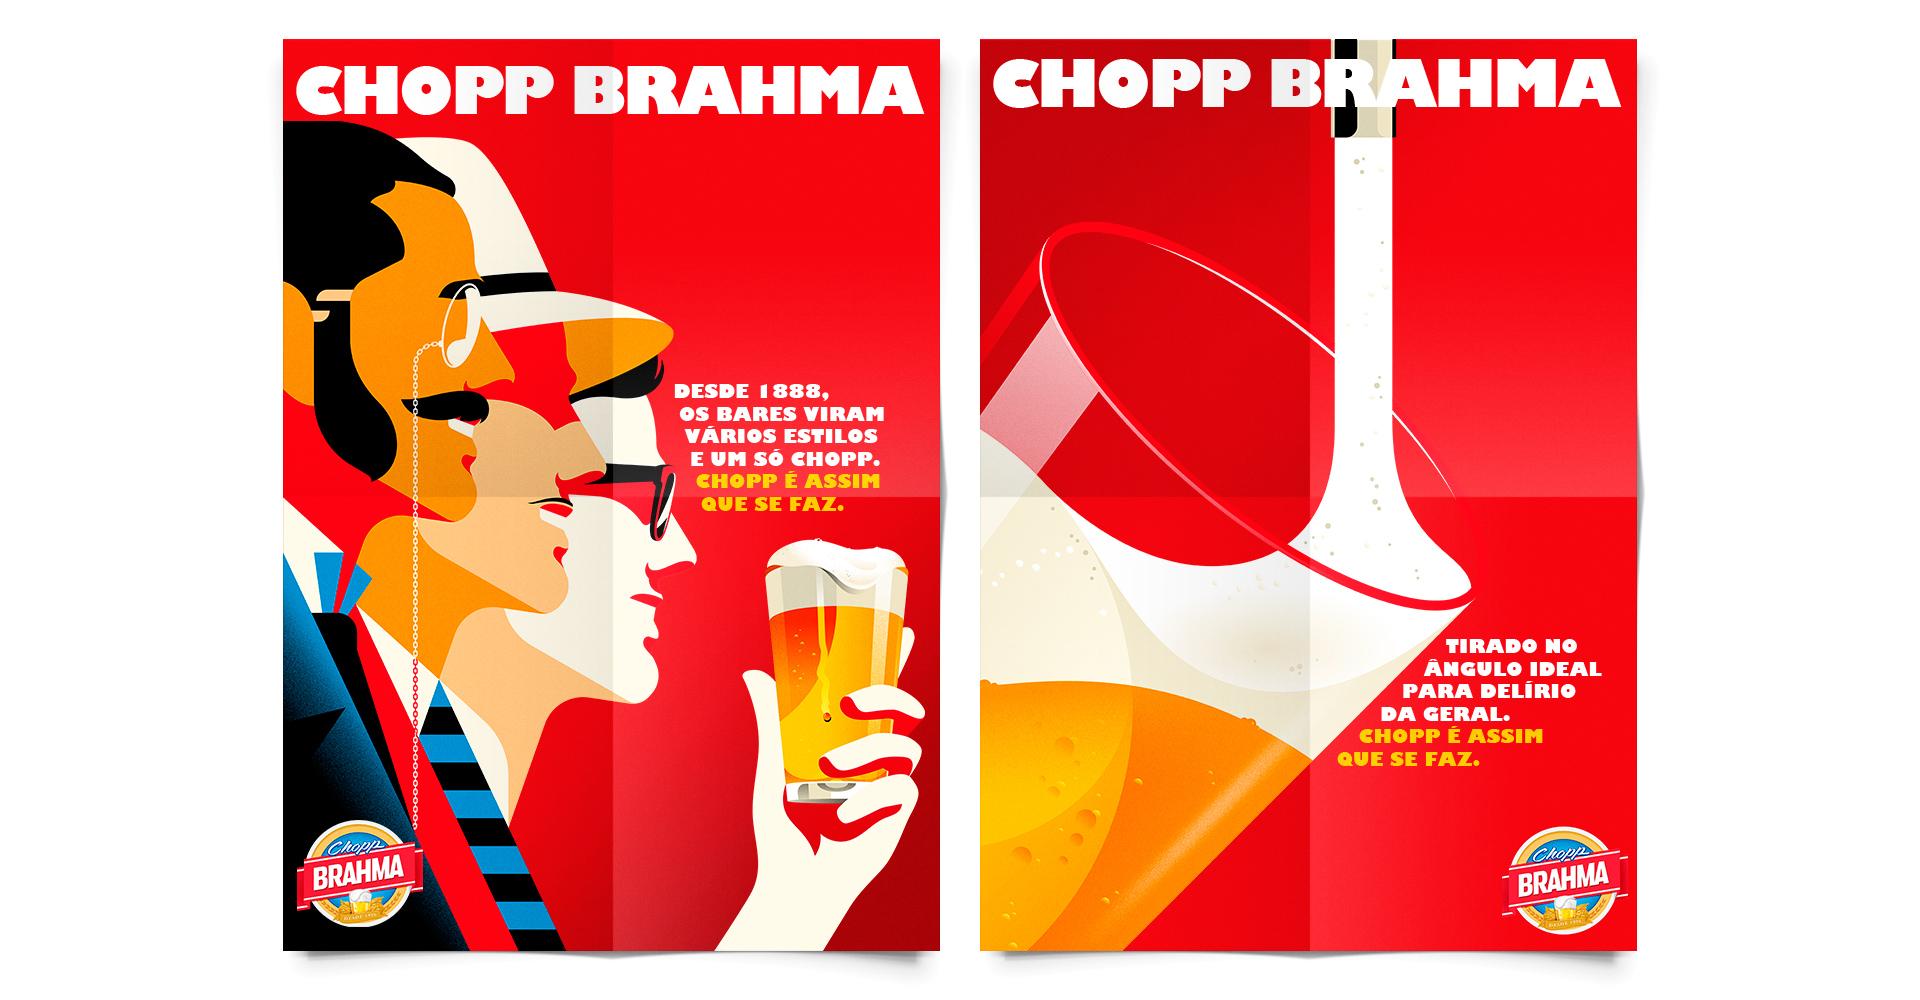 firmorama_chopp-brahma_04